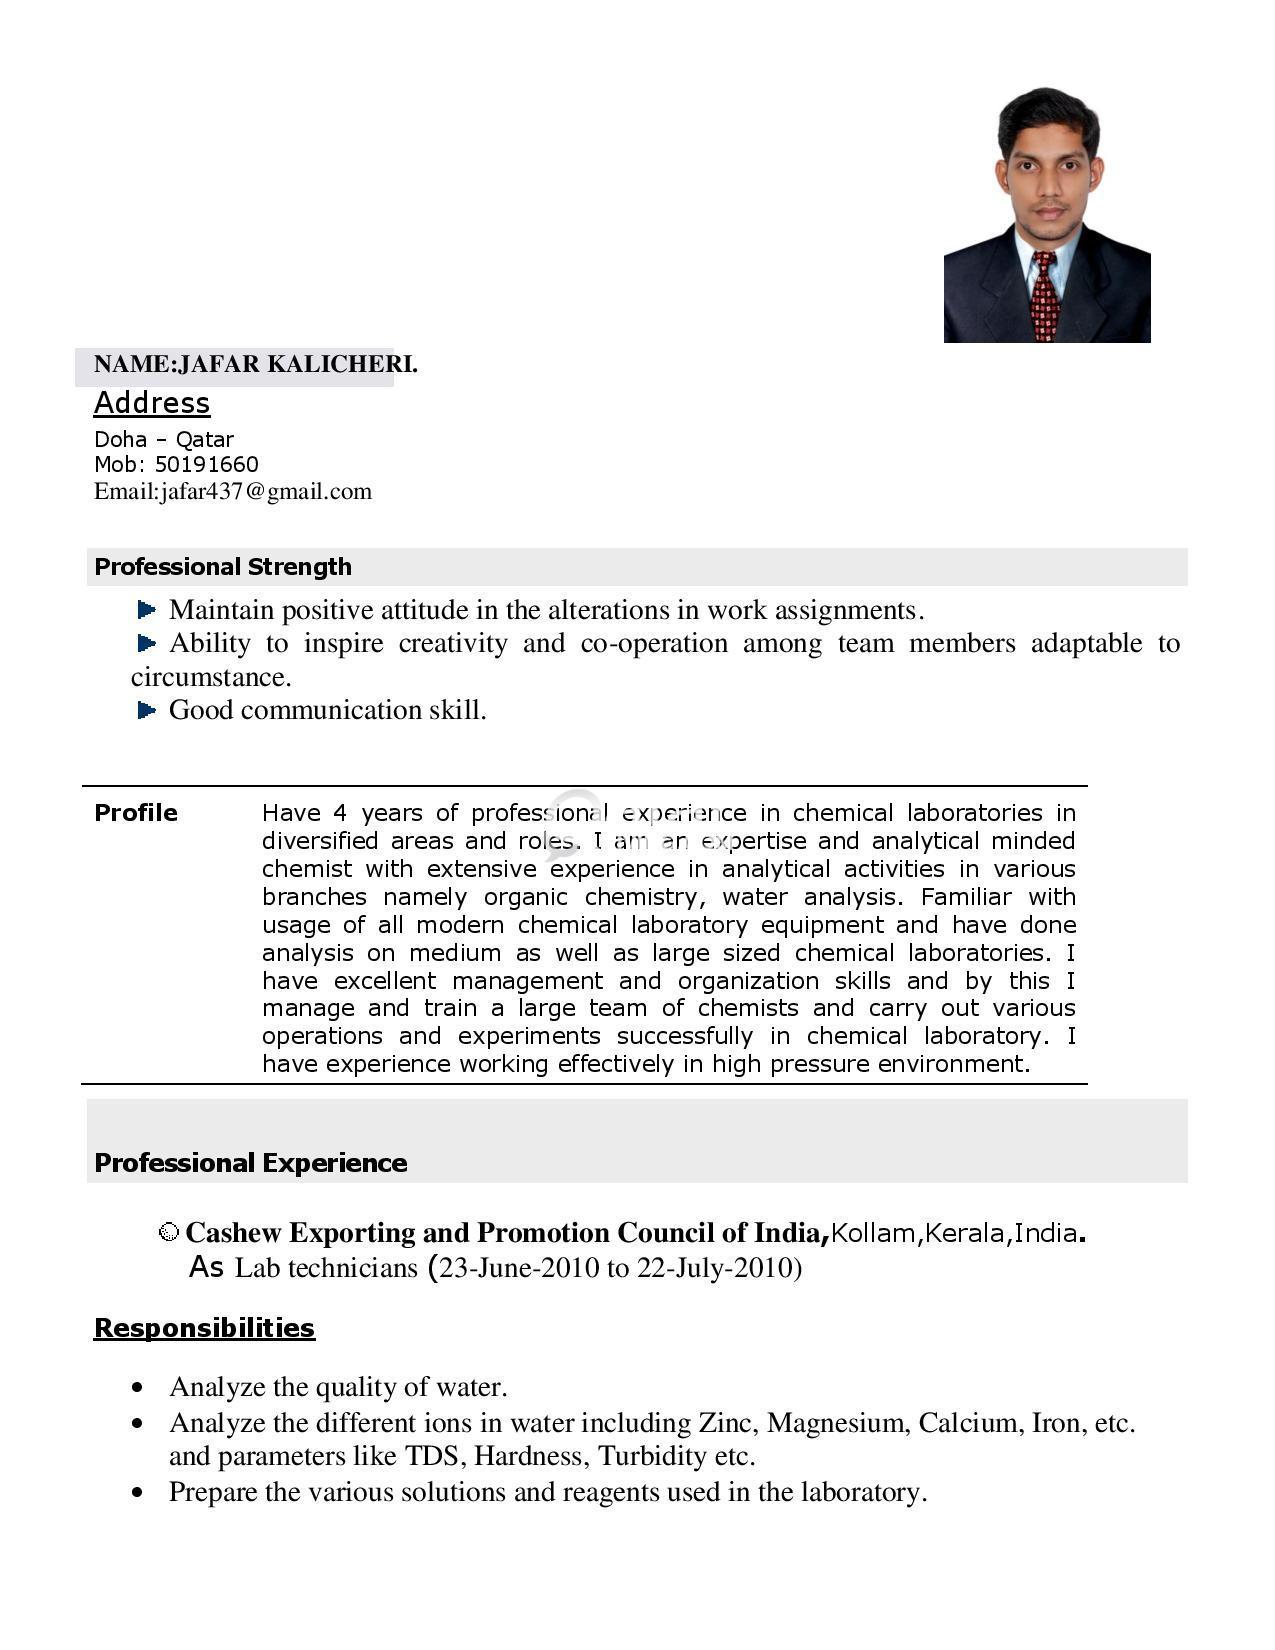 GCC Exp LAB TECHNICIAN/ CHEMIST | Qatar Living